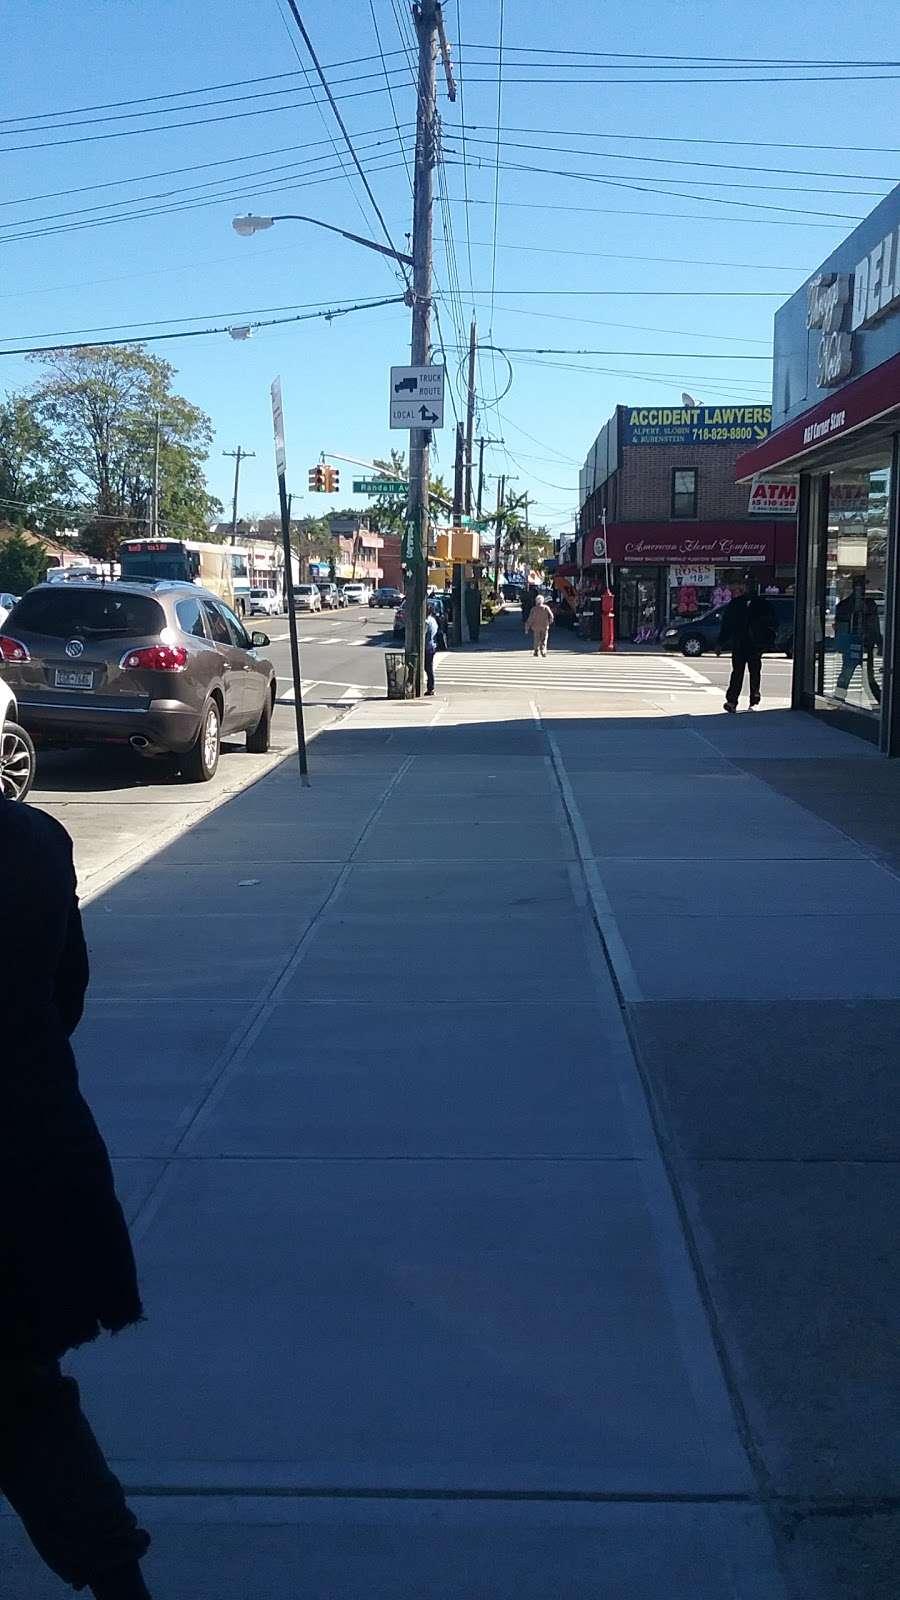 E Tremont Av/randall Av - bus station  | Photo 1 of 1 | Address: Bronx, NY 10465, USA